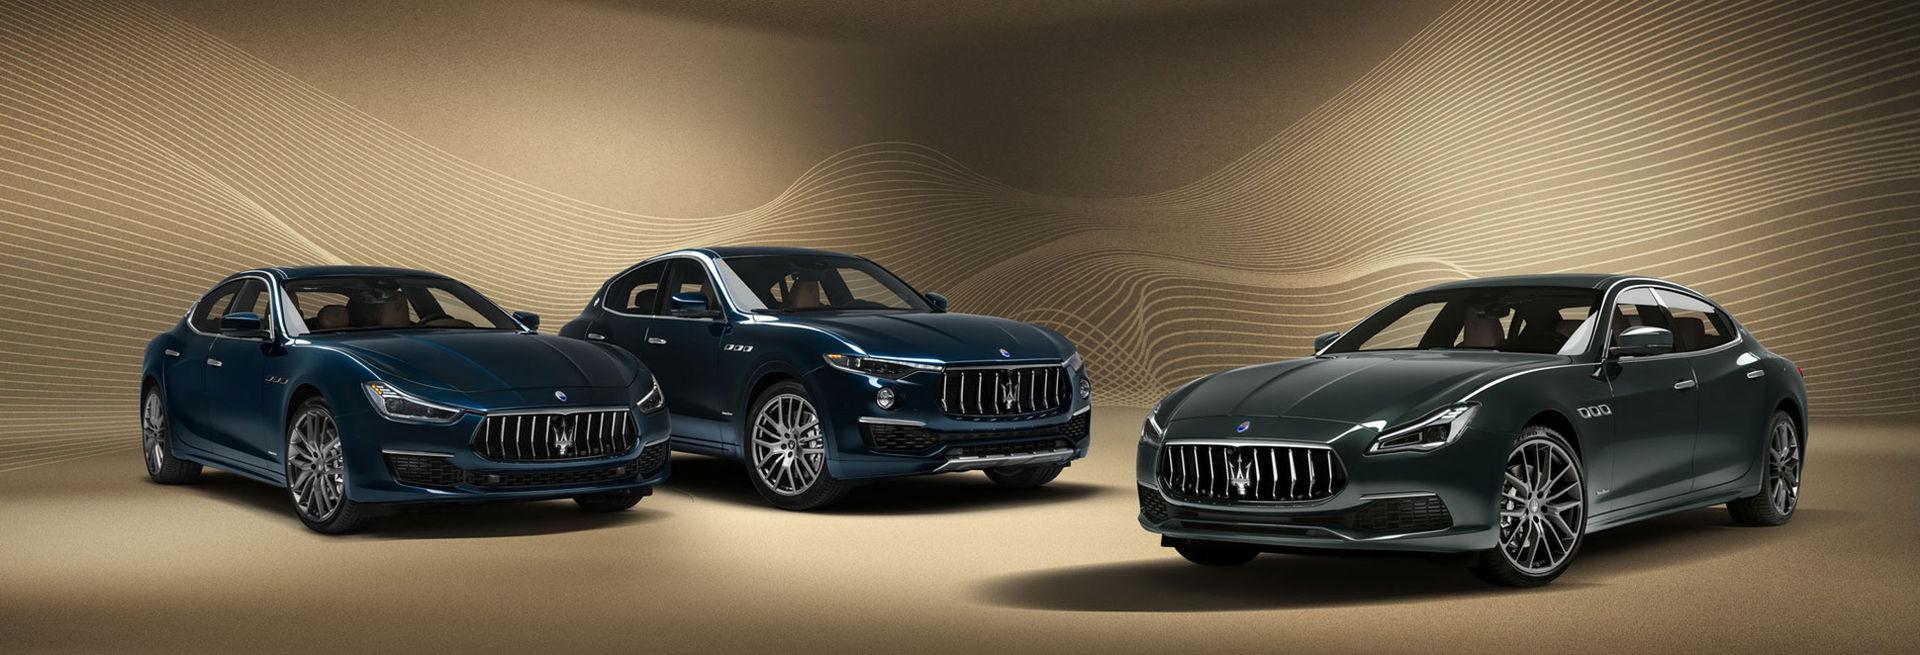 Maseratis modeller får Royale-versioner